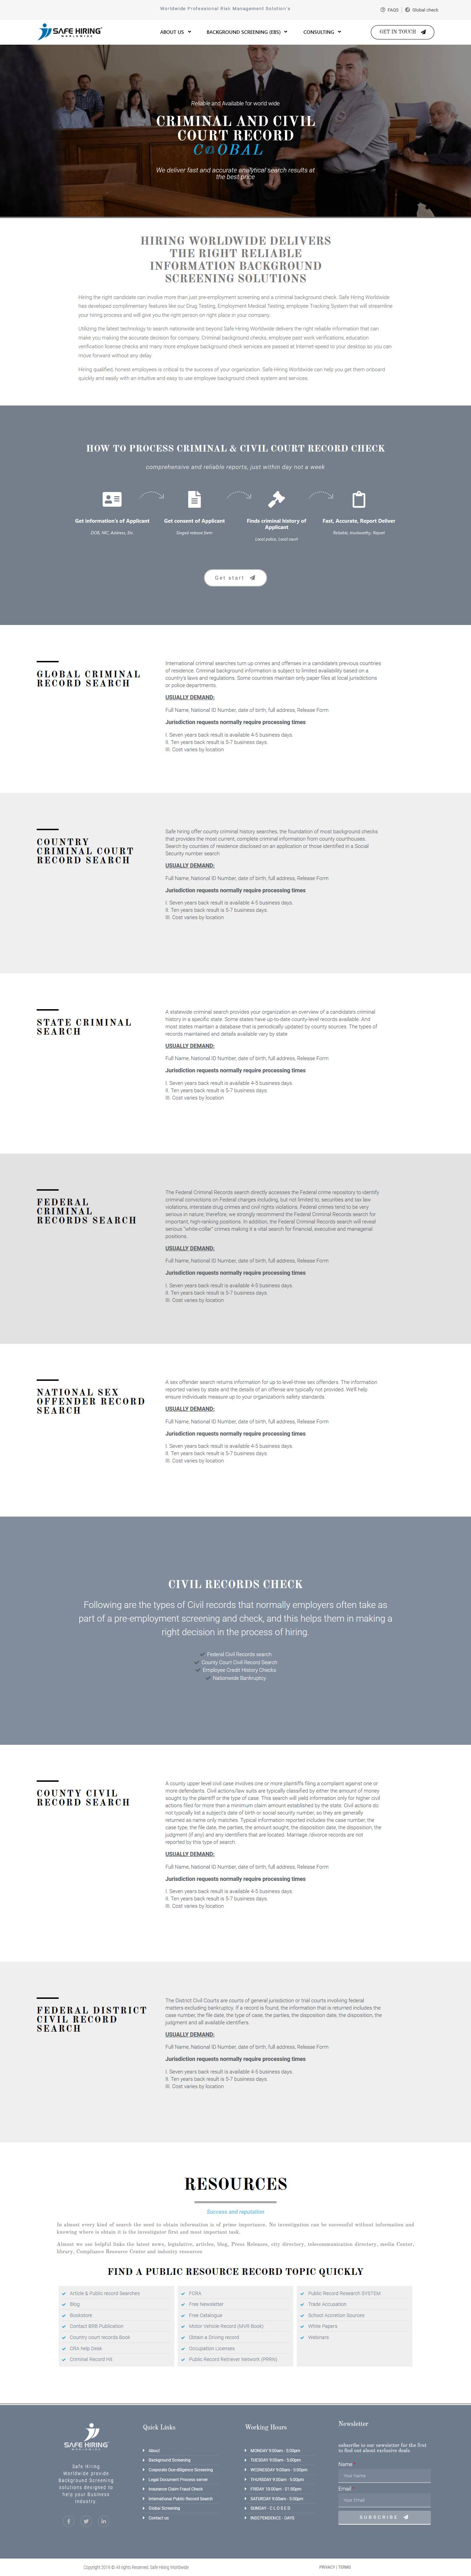 International Criminal Court Record Check Criminal Background Check Police Records Risk Management